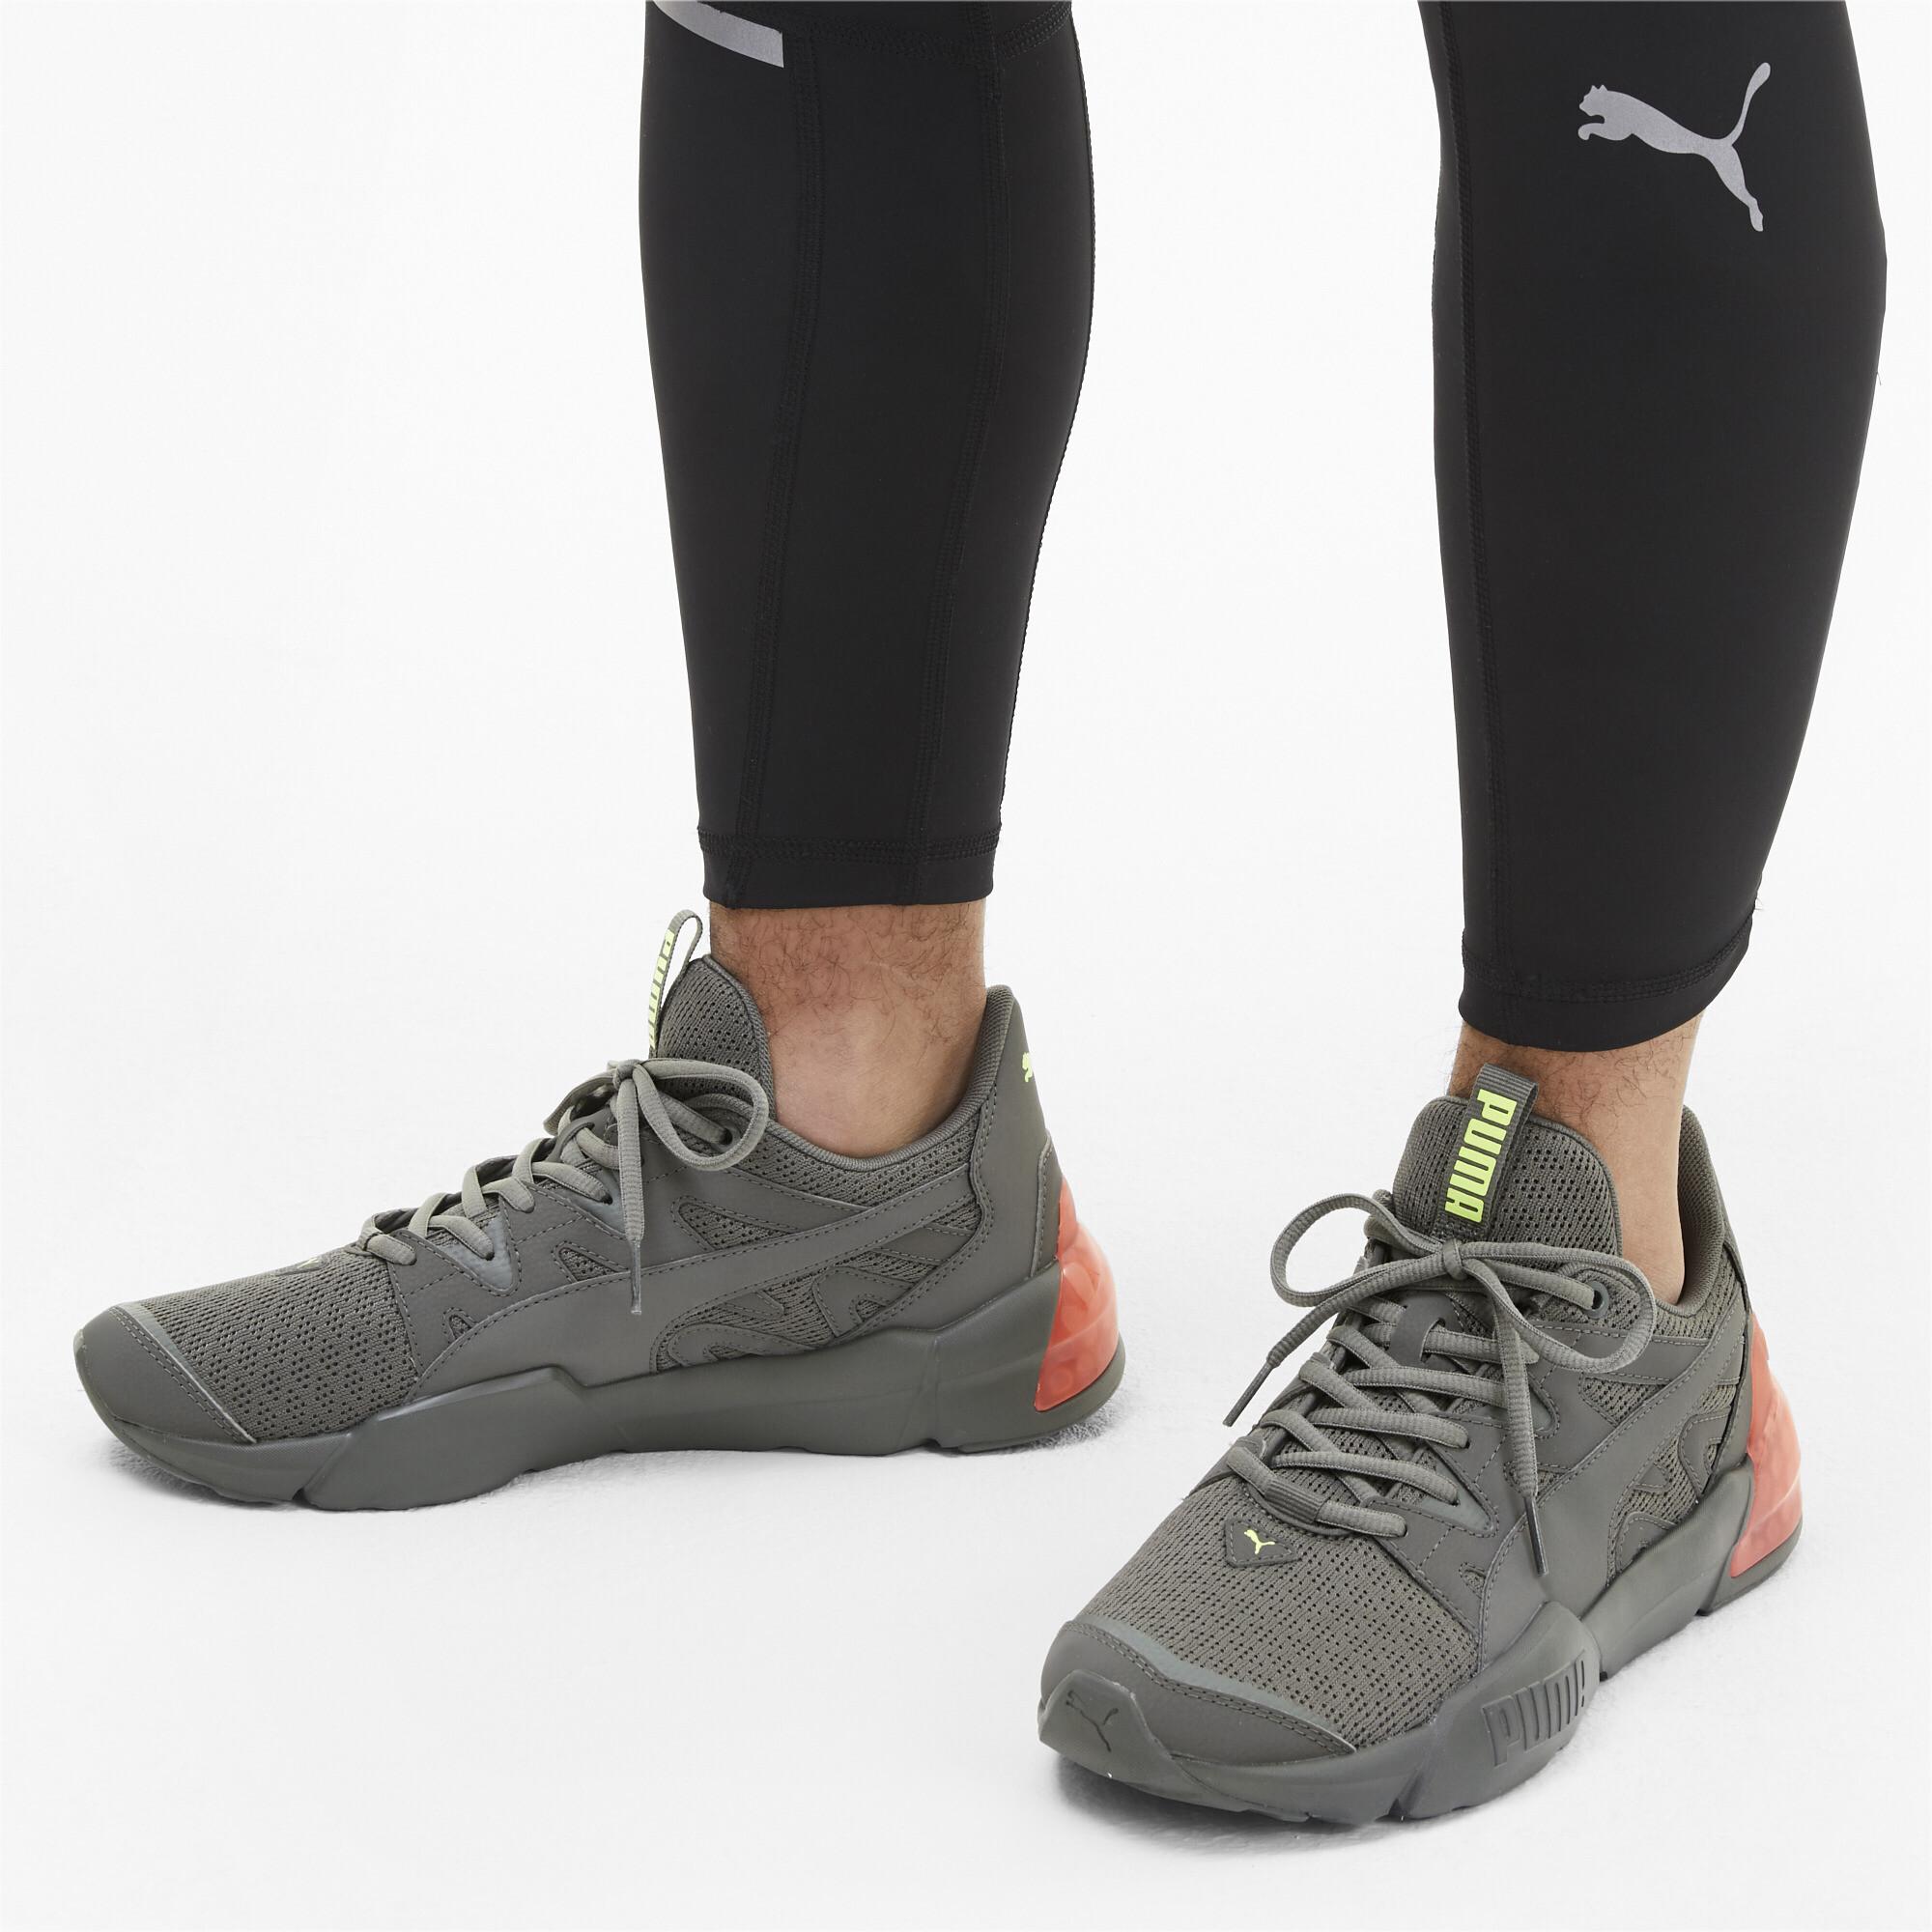 thumbnail 39 - PUMA Men's CELL Pharos Training Shoes